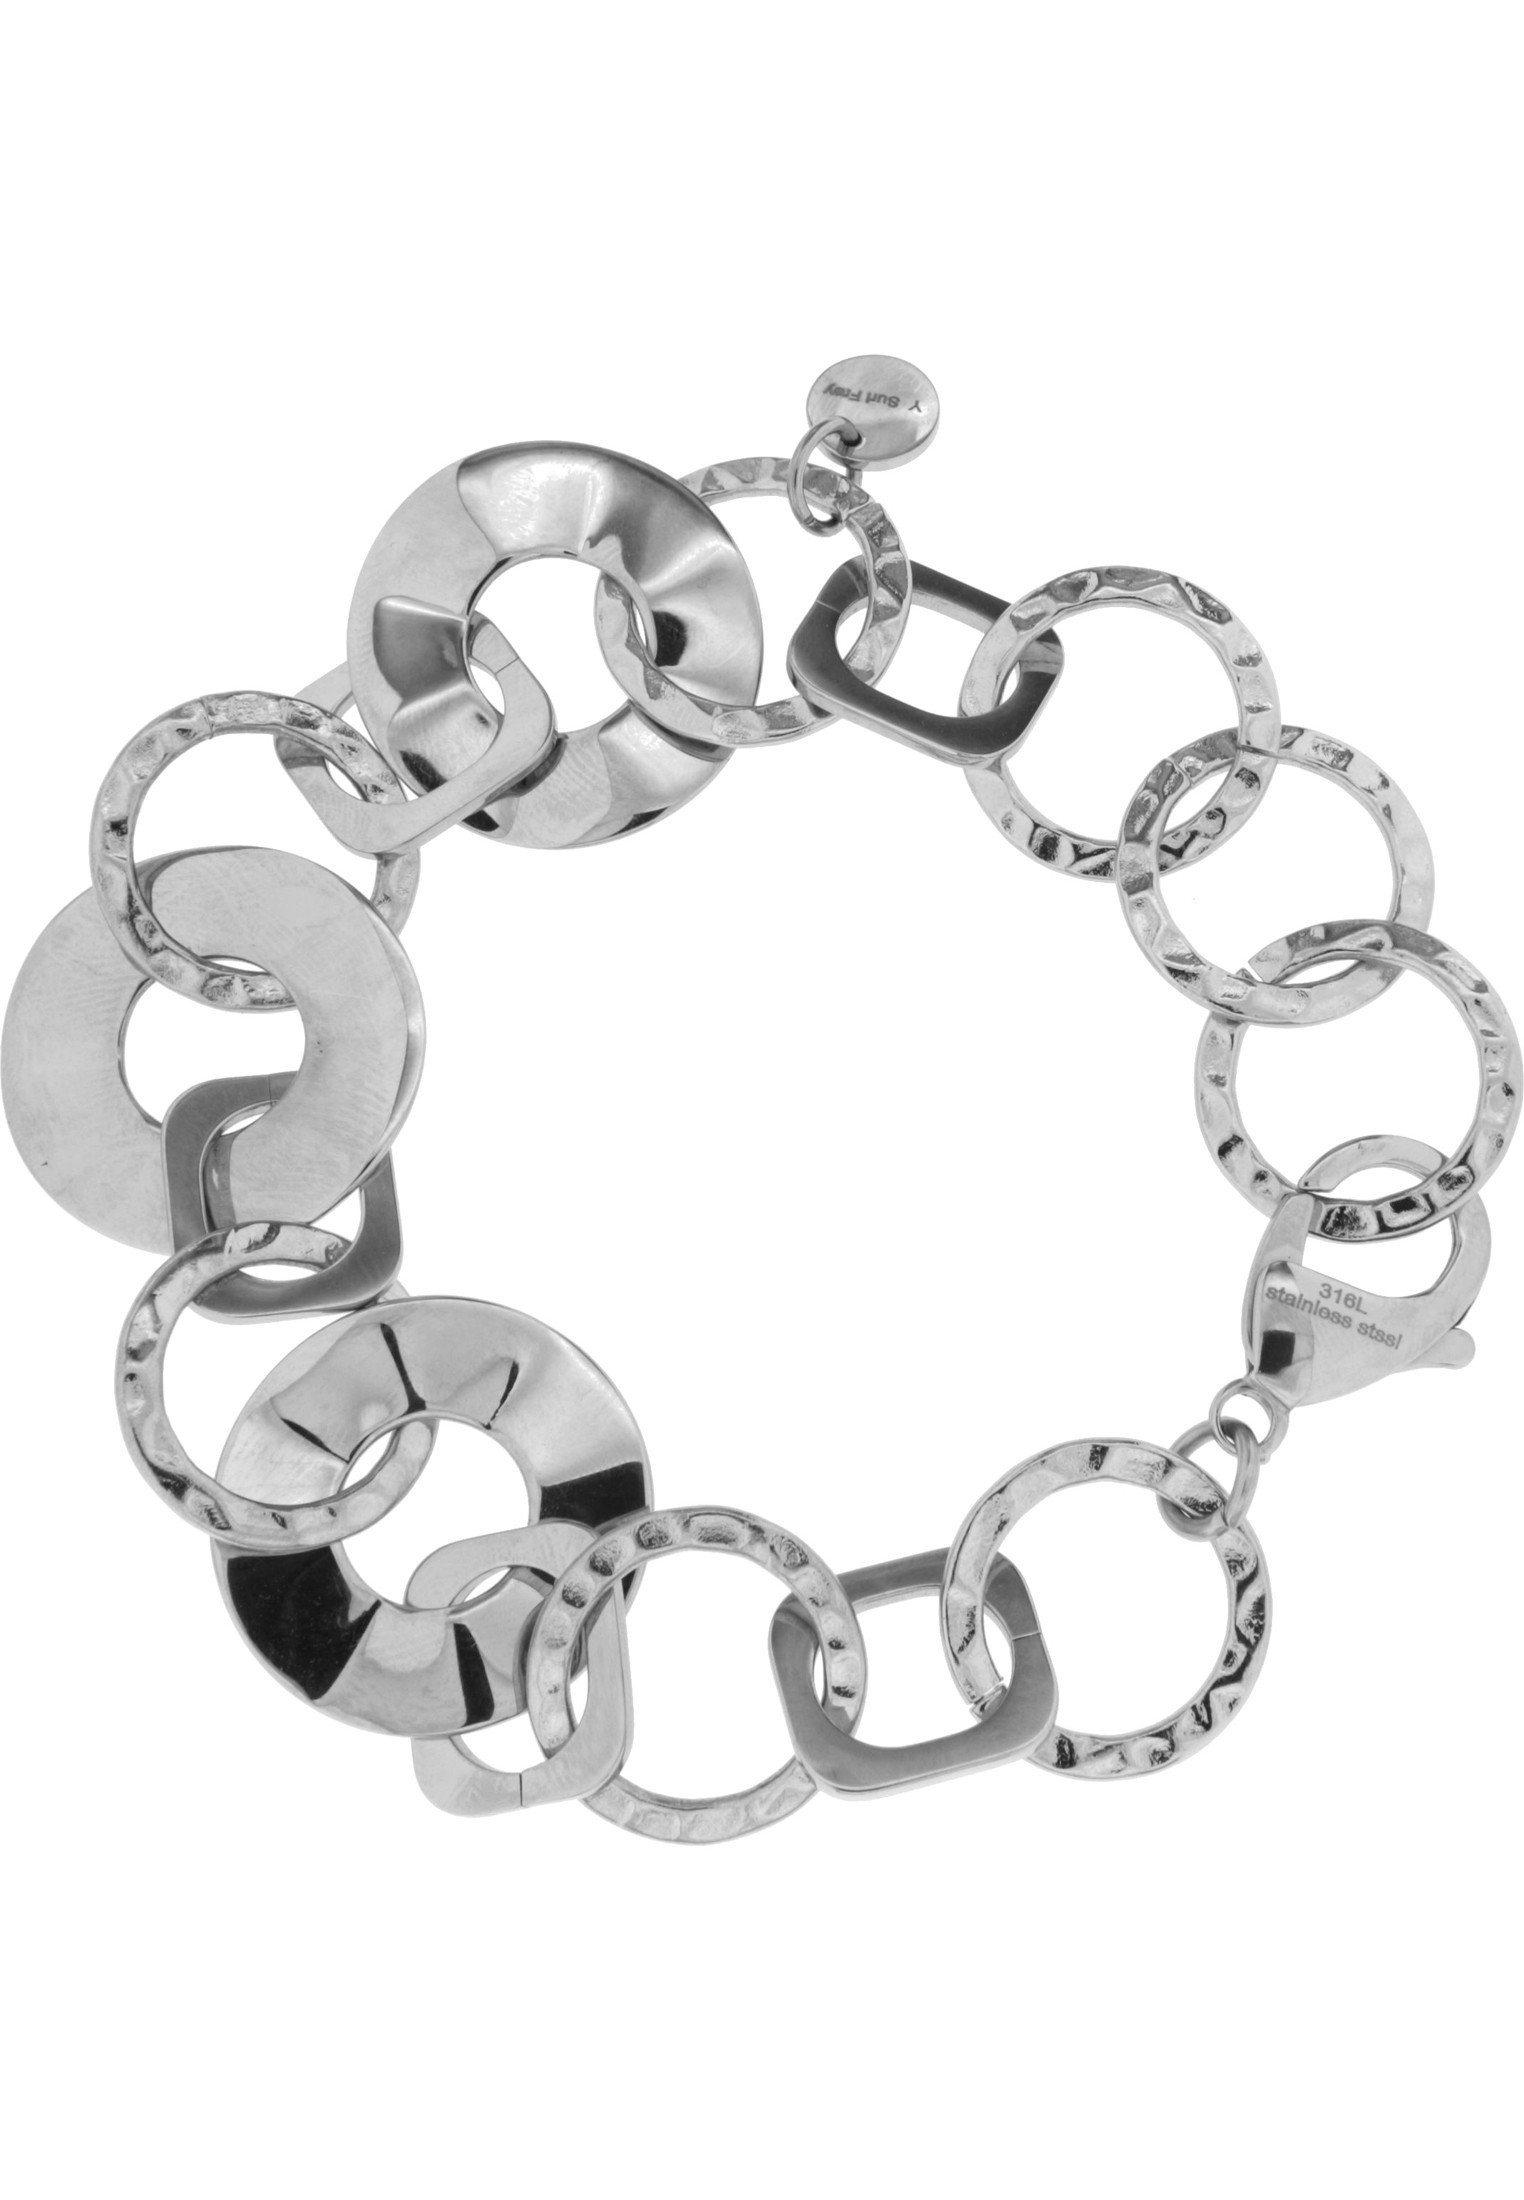 SURI FREY Armband »No.1 Bonny« | Schmuck > Armbänder > Sonstige Armbänder | SURI FREY